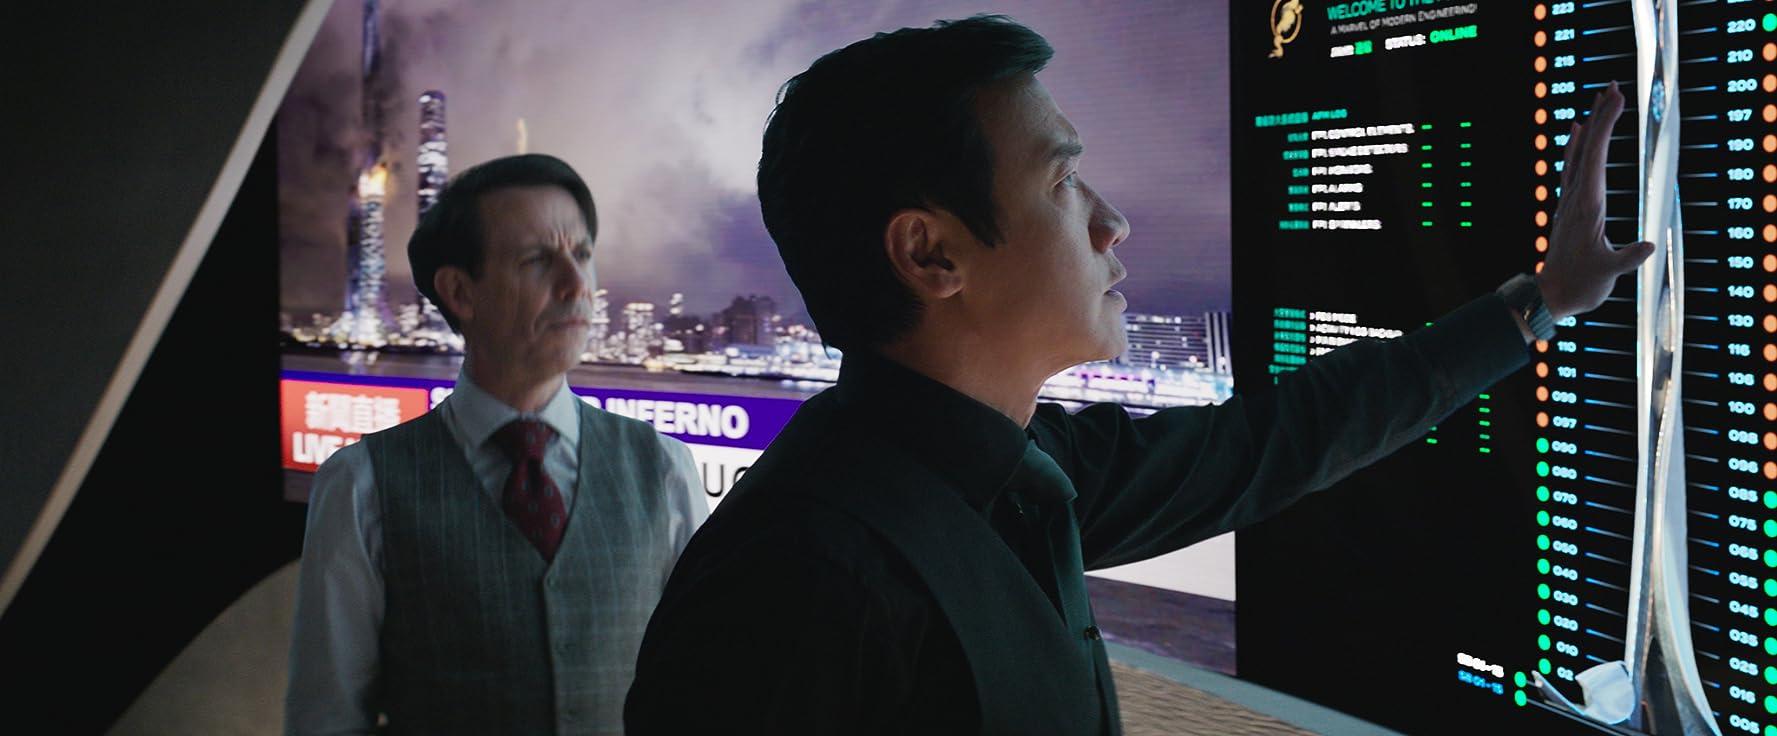 Noah Taylor and Chin Han in Skyscraper (2018)